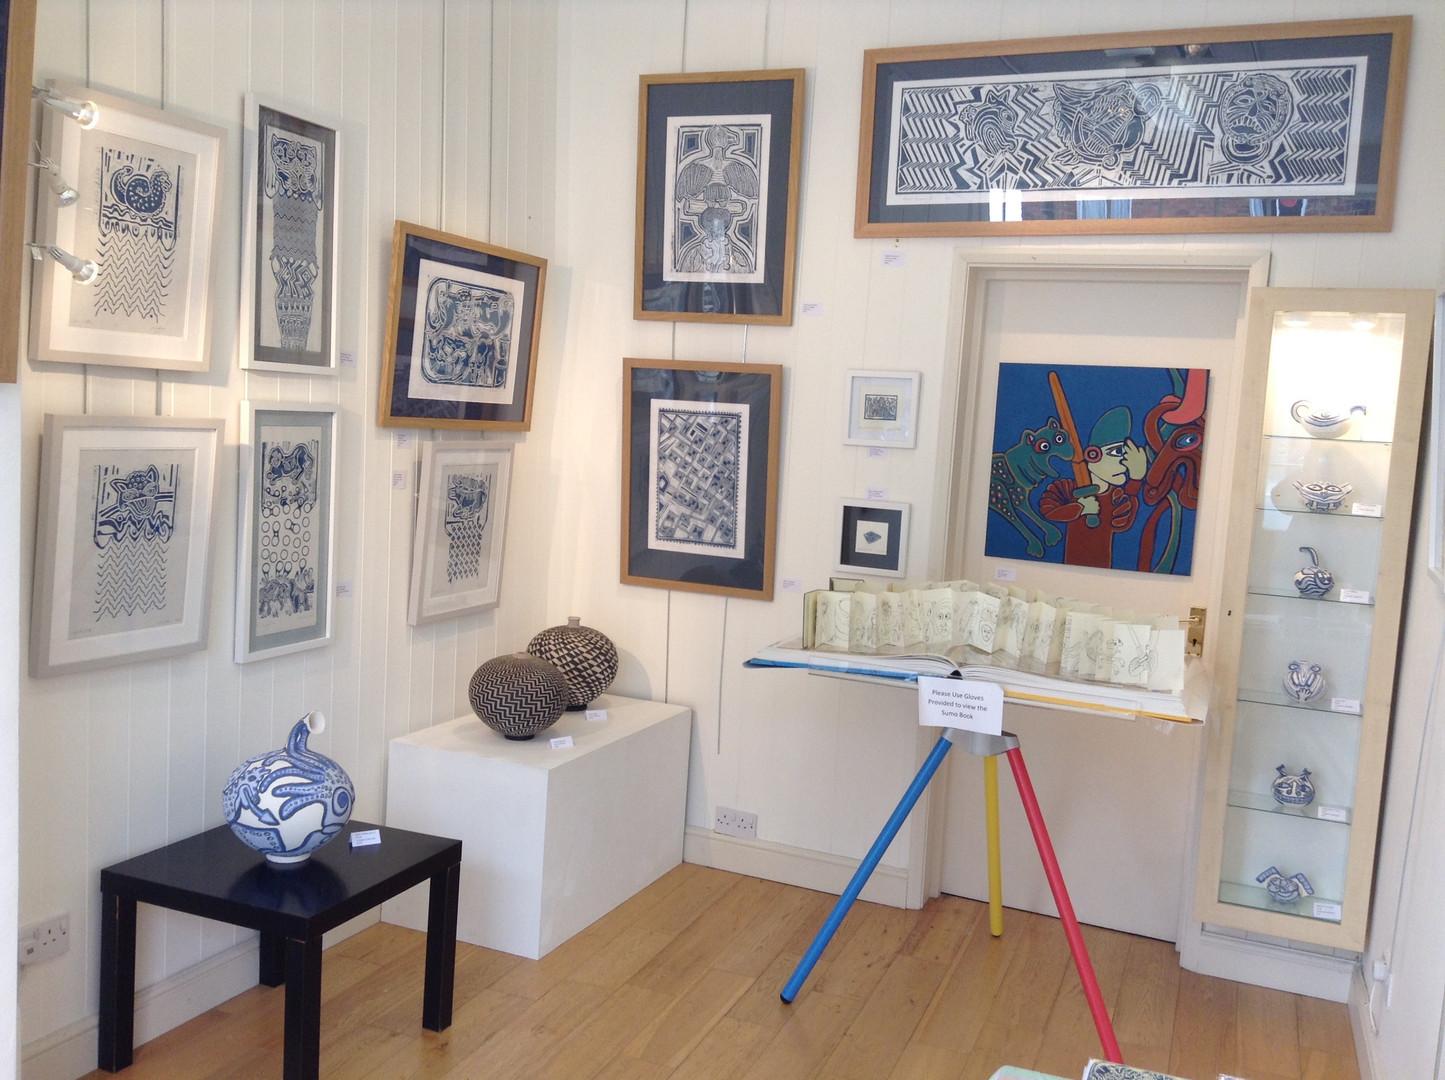 Gallery 49 Exhibition 011.jpg